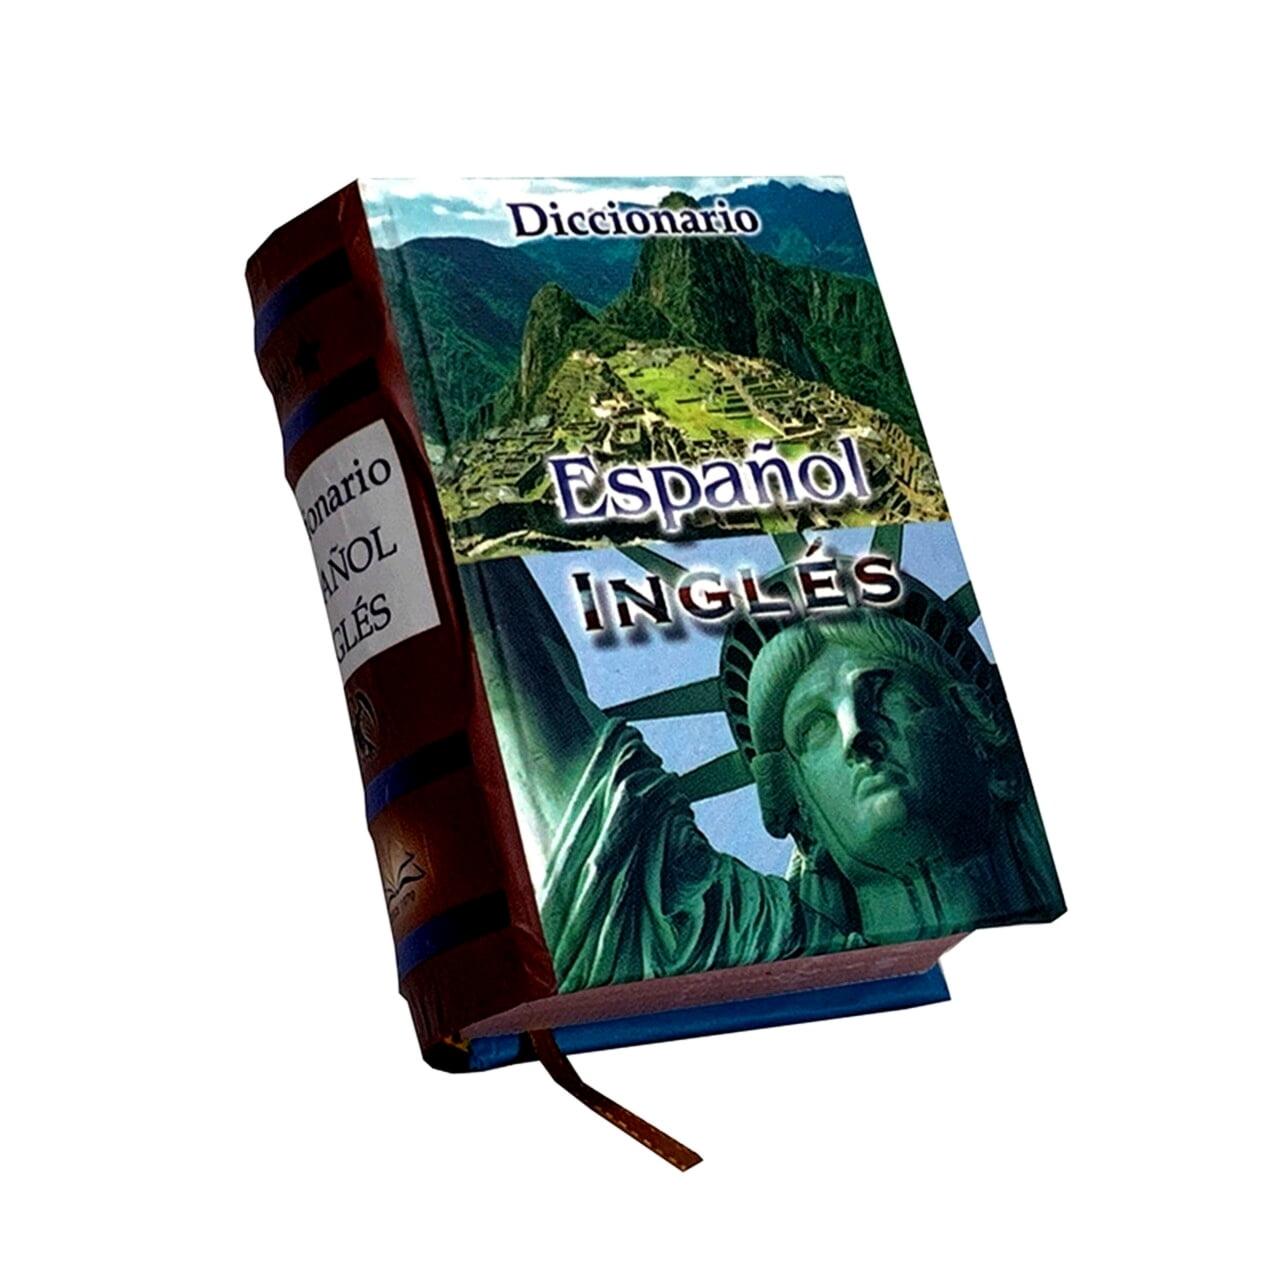 Diccionario-Espanol-Ingles-miniature-book-libro